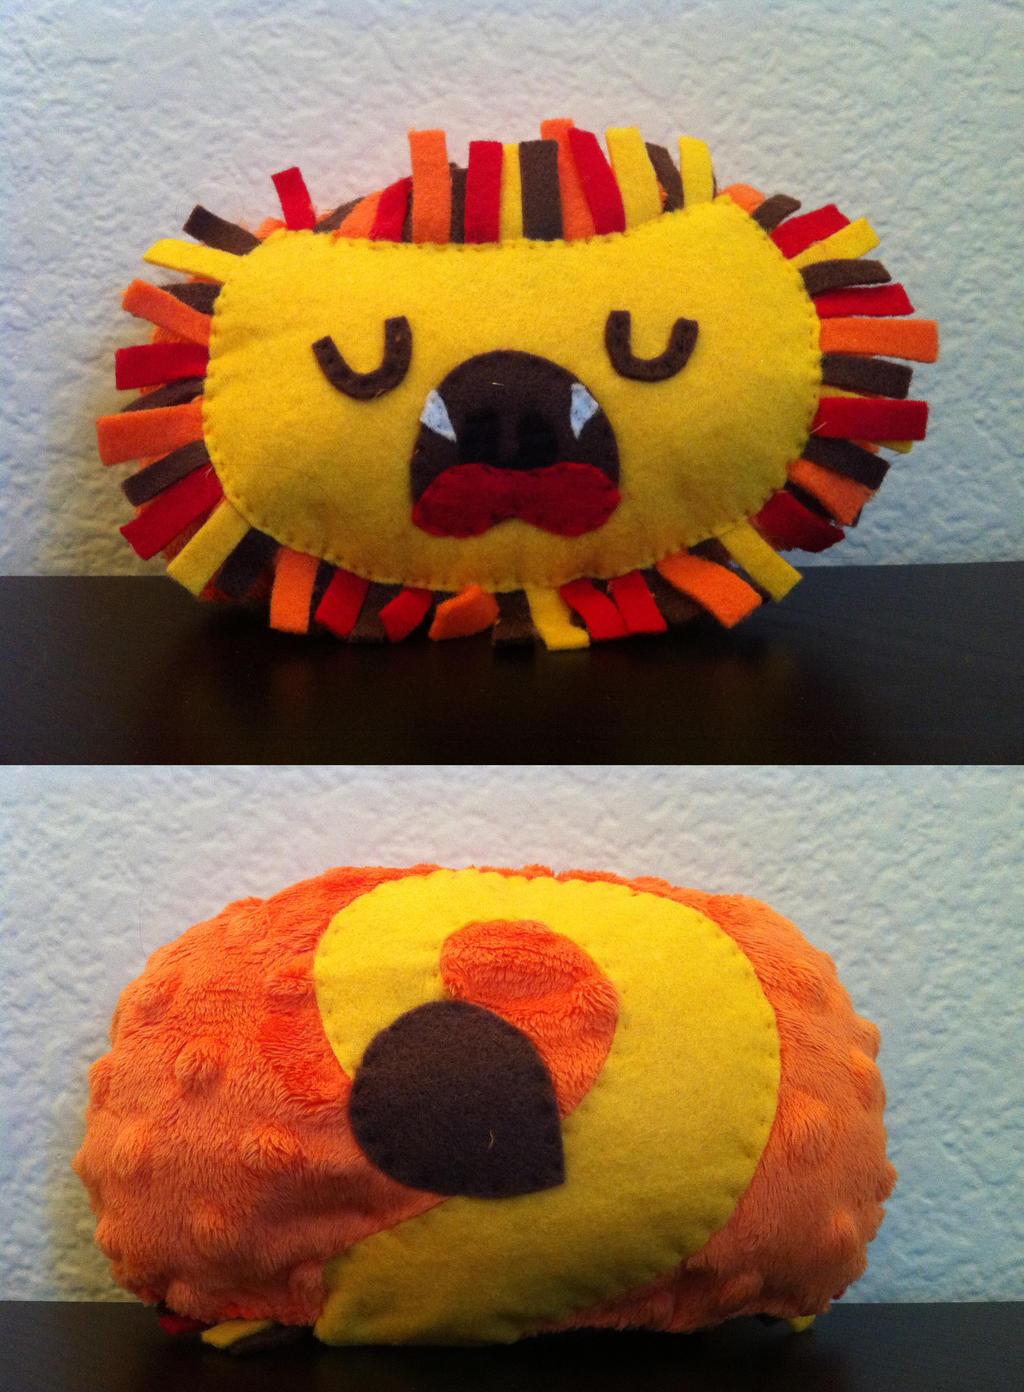 Aslan the Lion by akillertofu